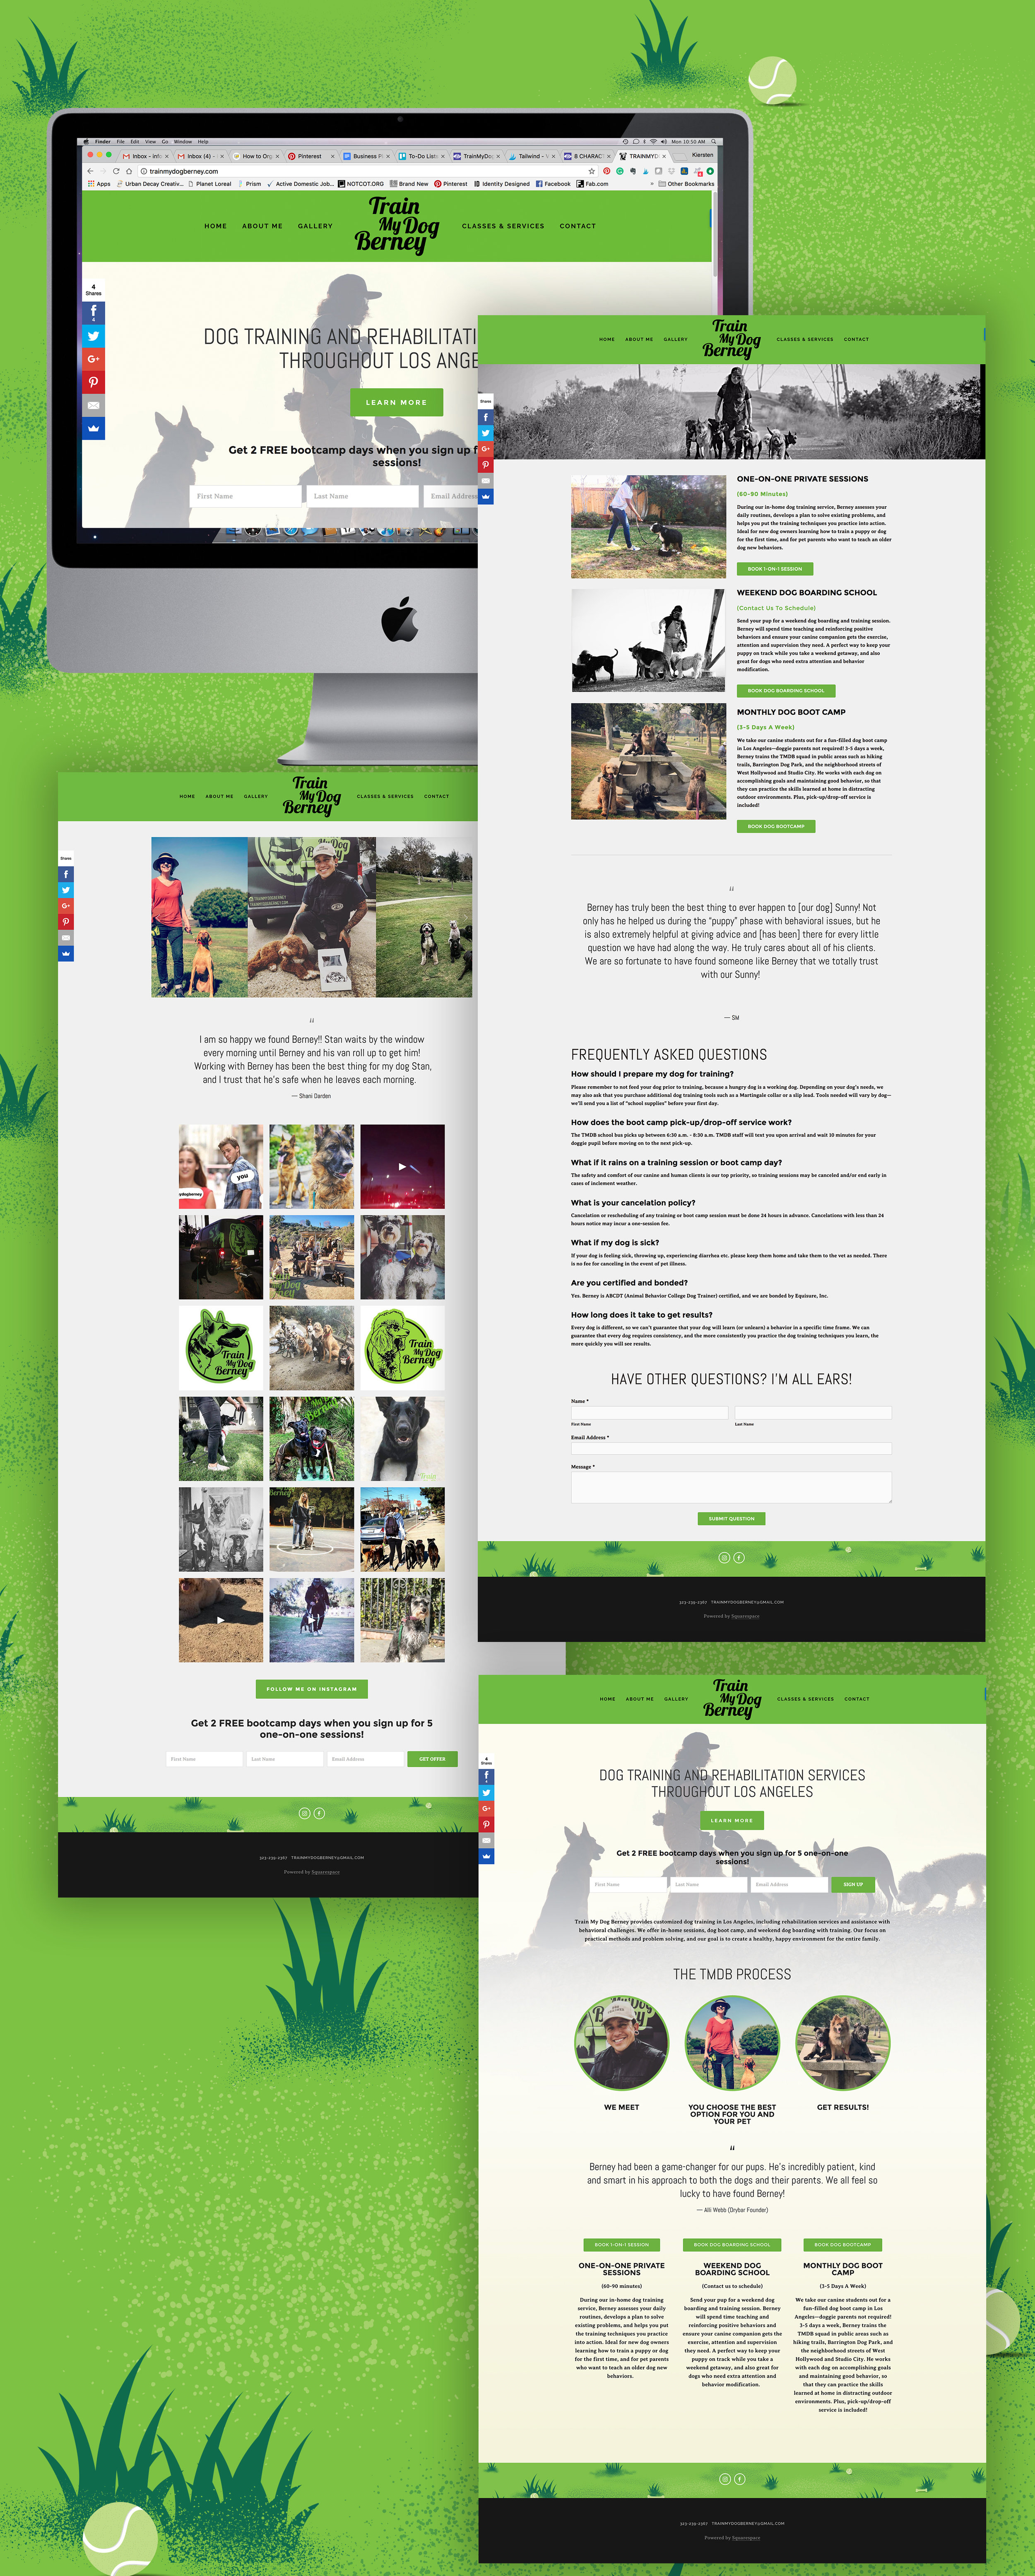 Train My Dog Berney Identity | EyeSavvy Design Studio | Website design, Layout design #BrandDesign #Pattern #BrandIdentity #Logo #Design #VisualBrand